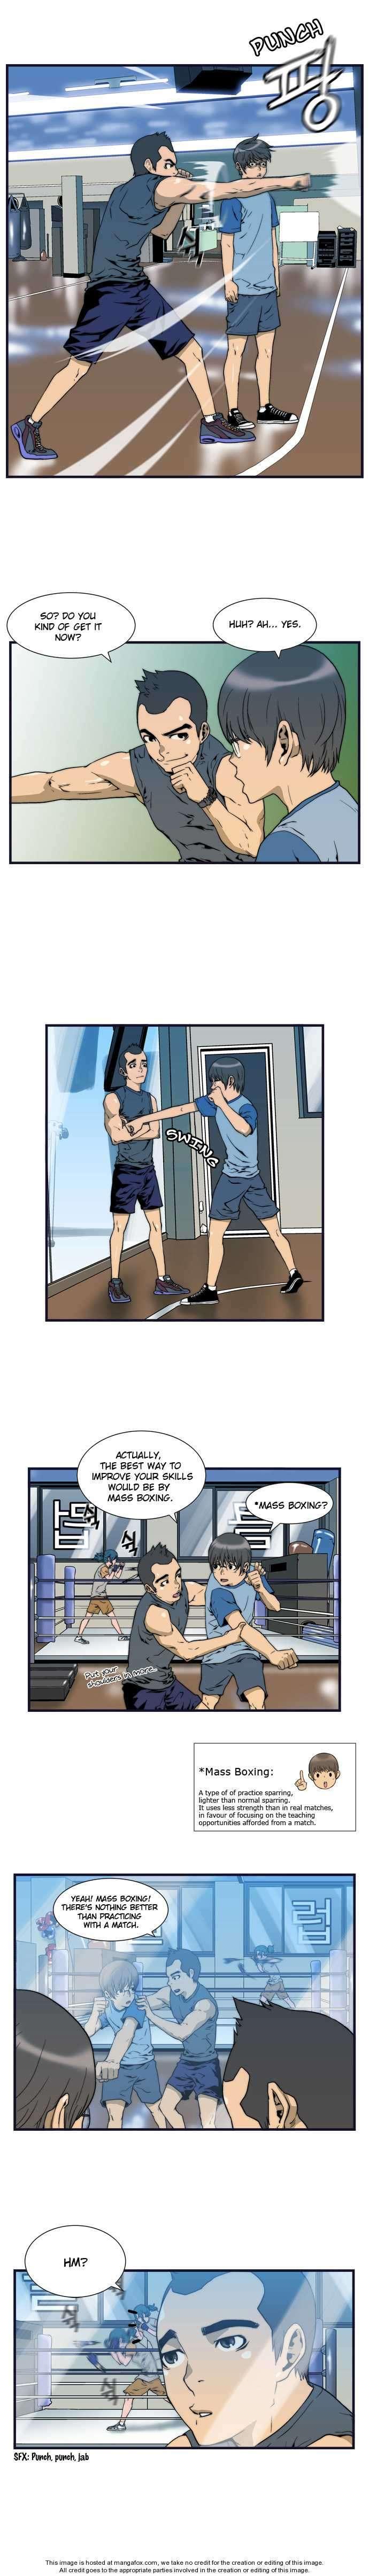 Green Boy 2 Page 2